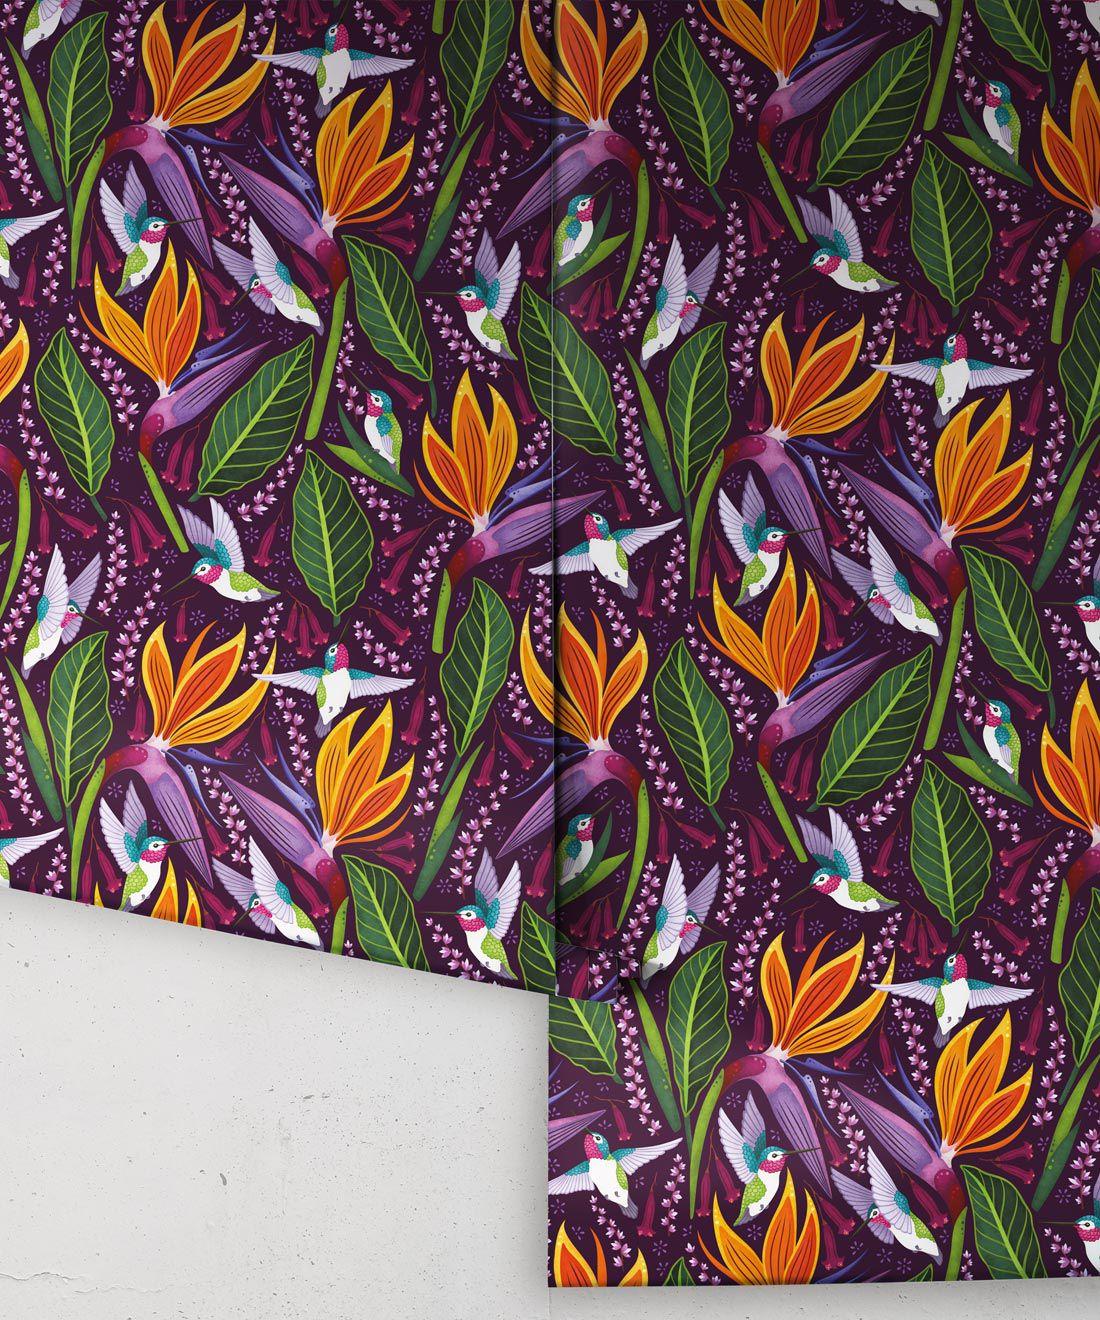 Hummingbird Wallpaper • Birds Of Paradise Flower • Bird Wallpaper • Purple Wallpaper Drops